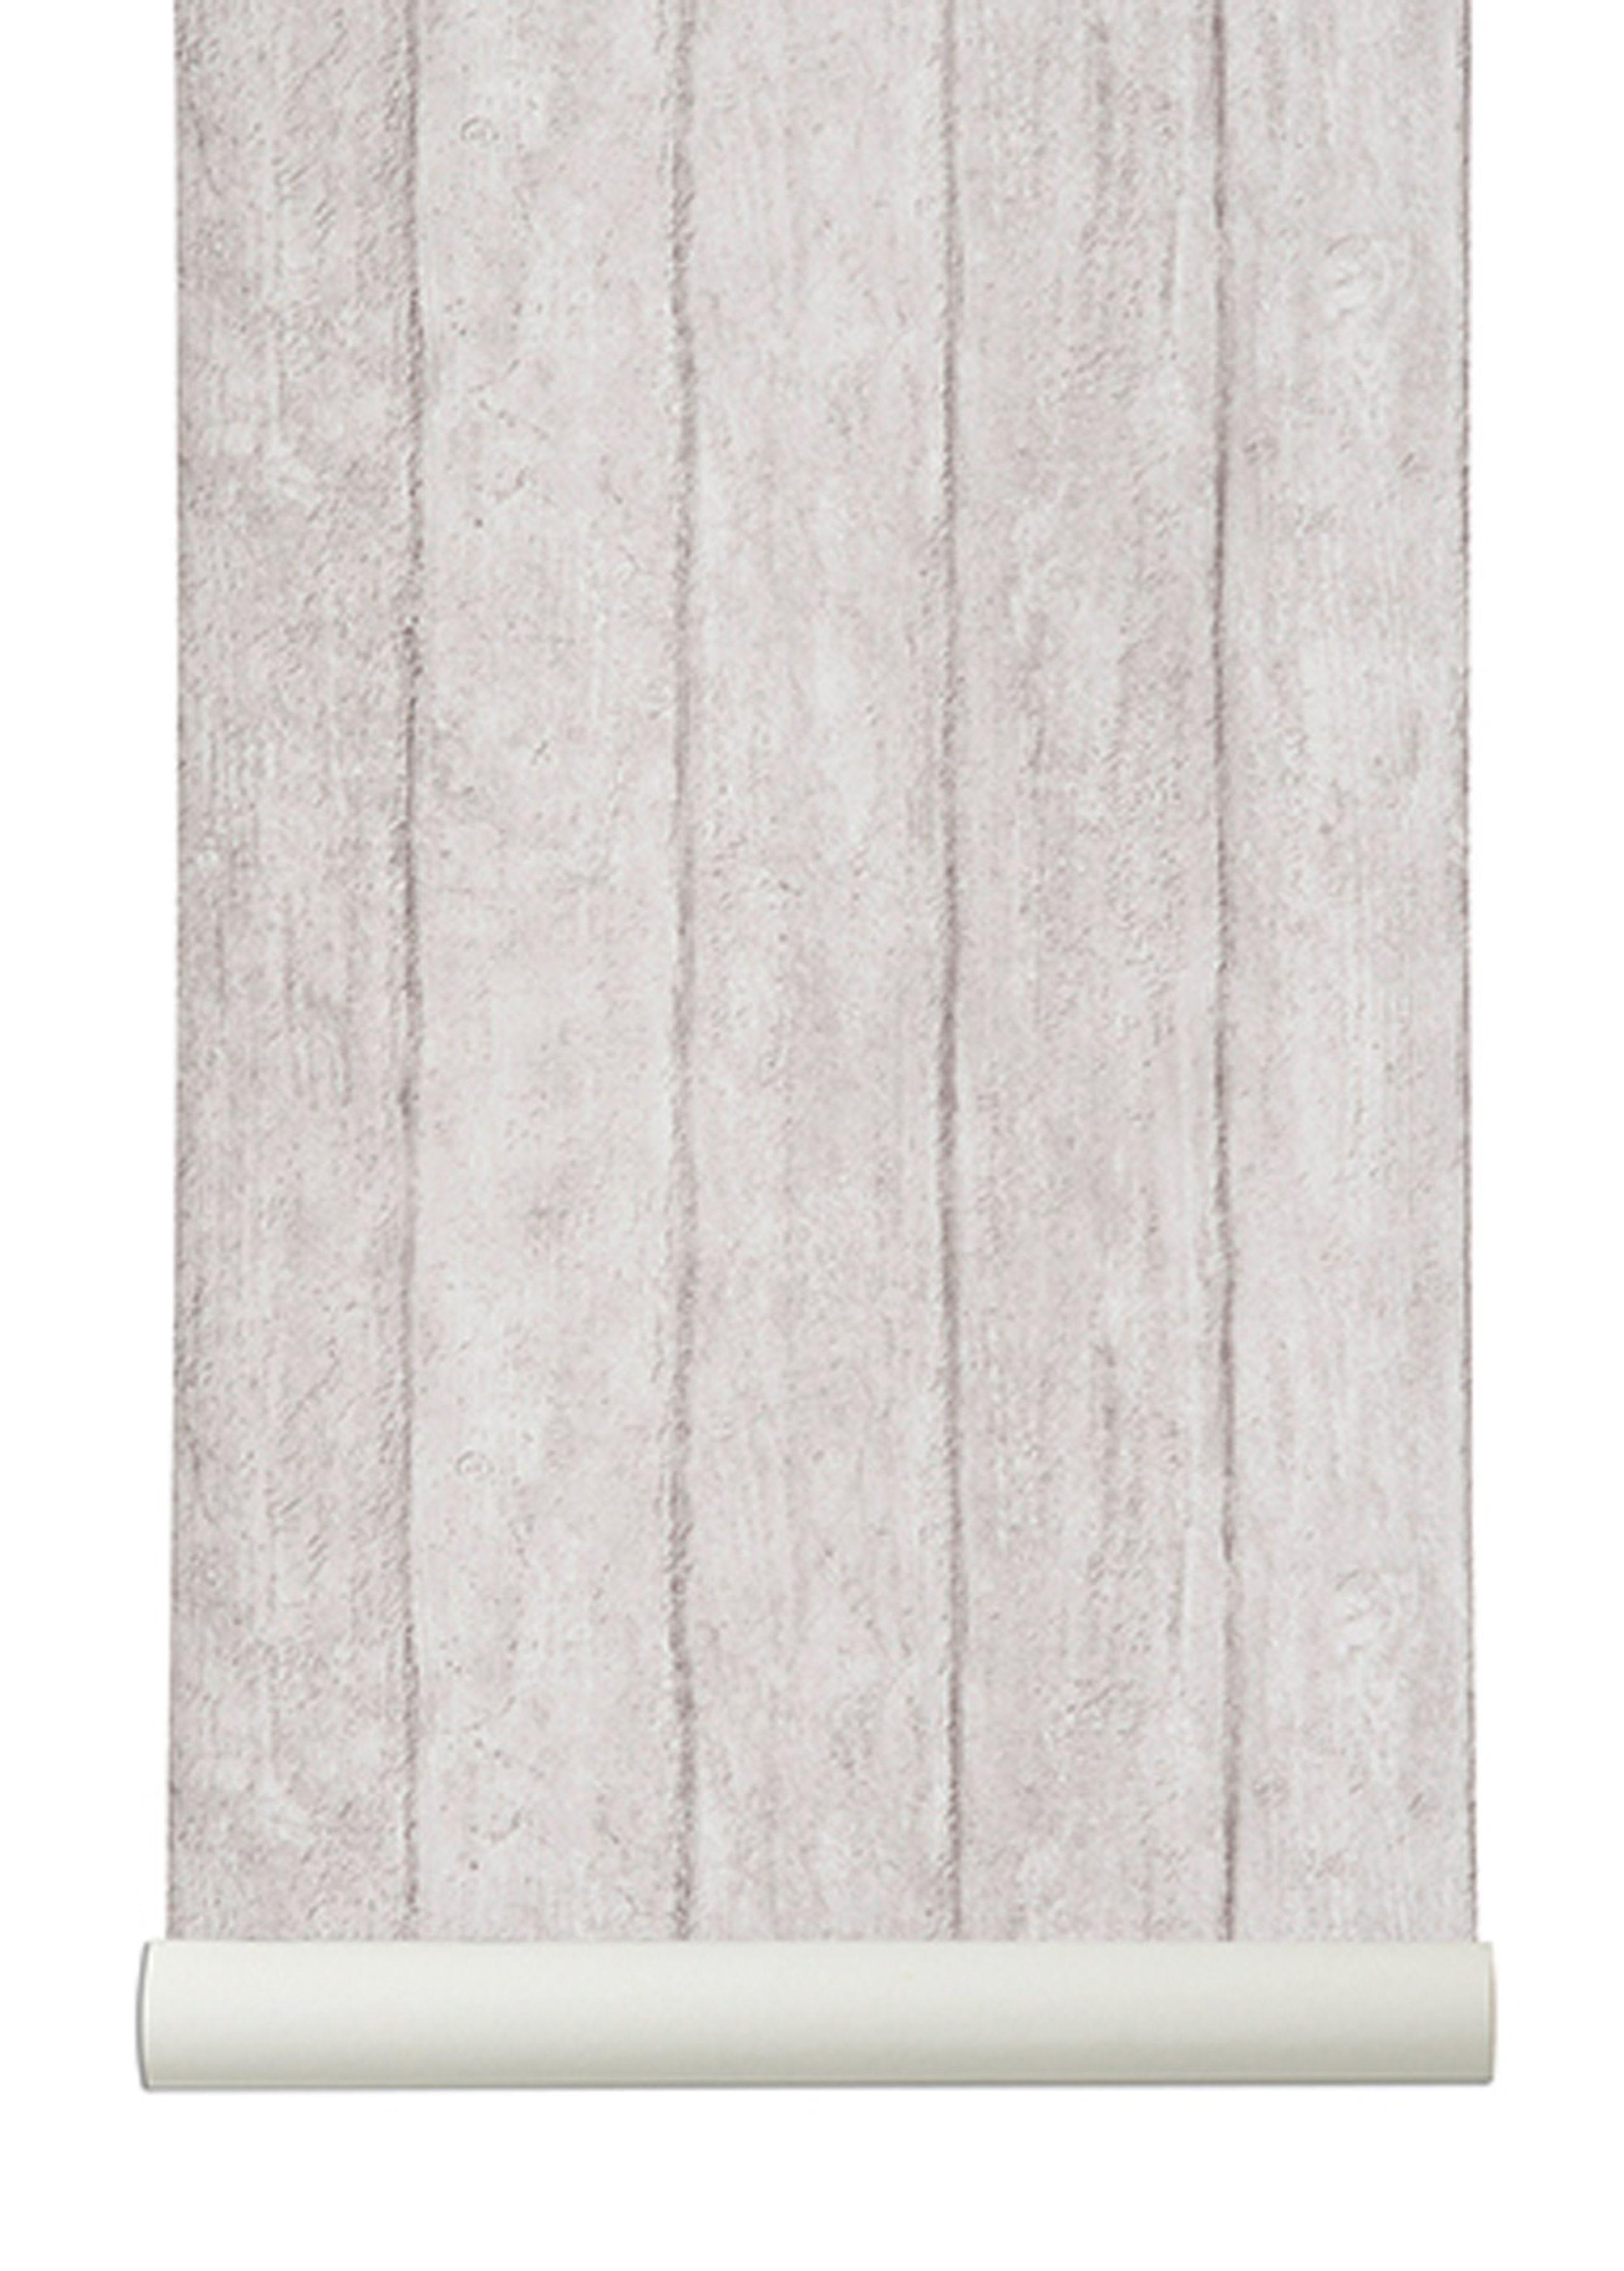 Image of   Concrete Wallpaper